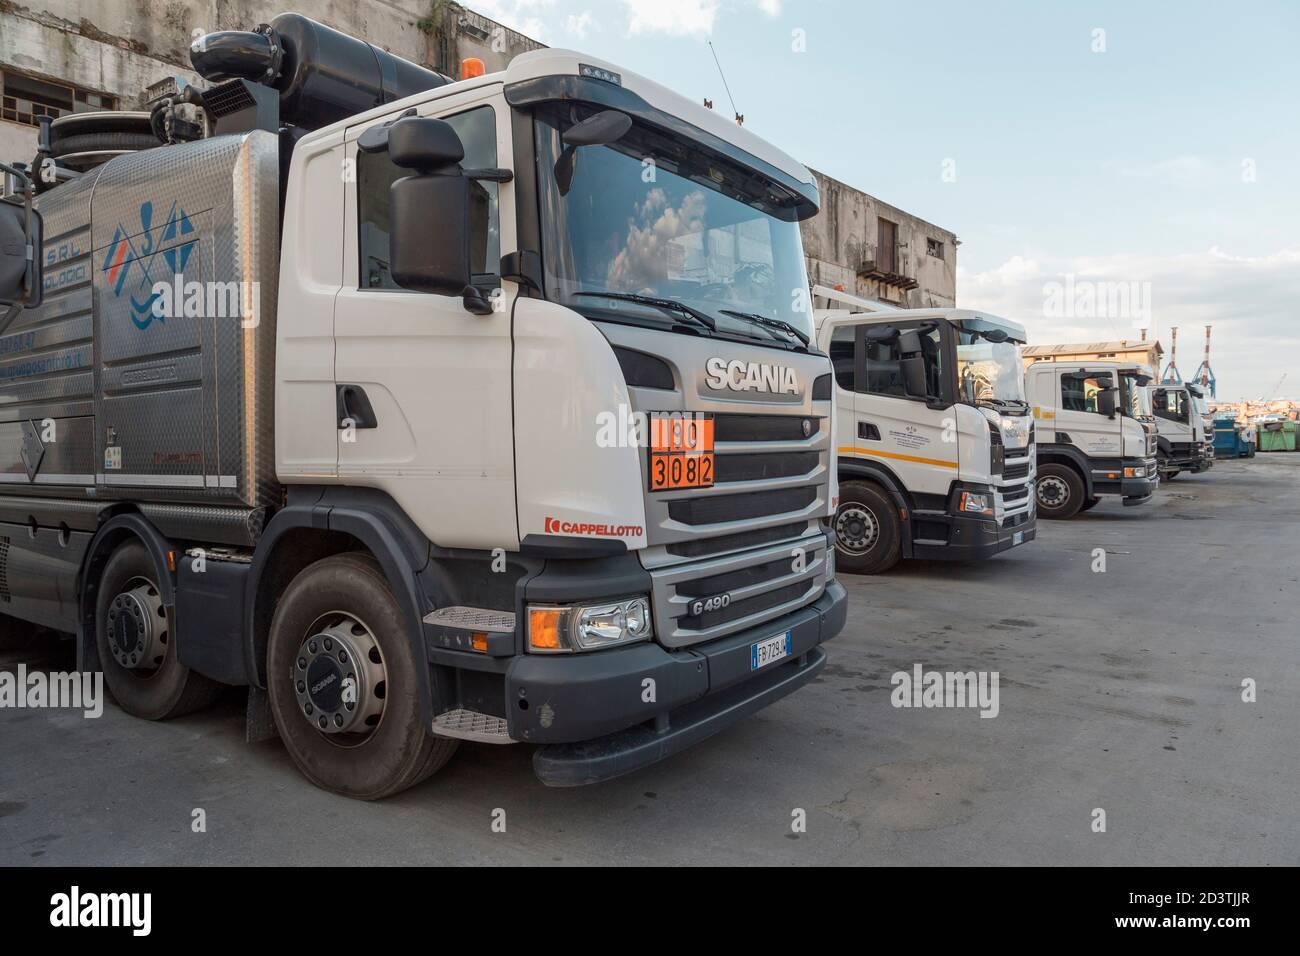 Septic truck, Genoa, Liguria, Italy, Europe Stock Photo